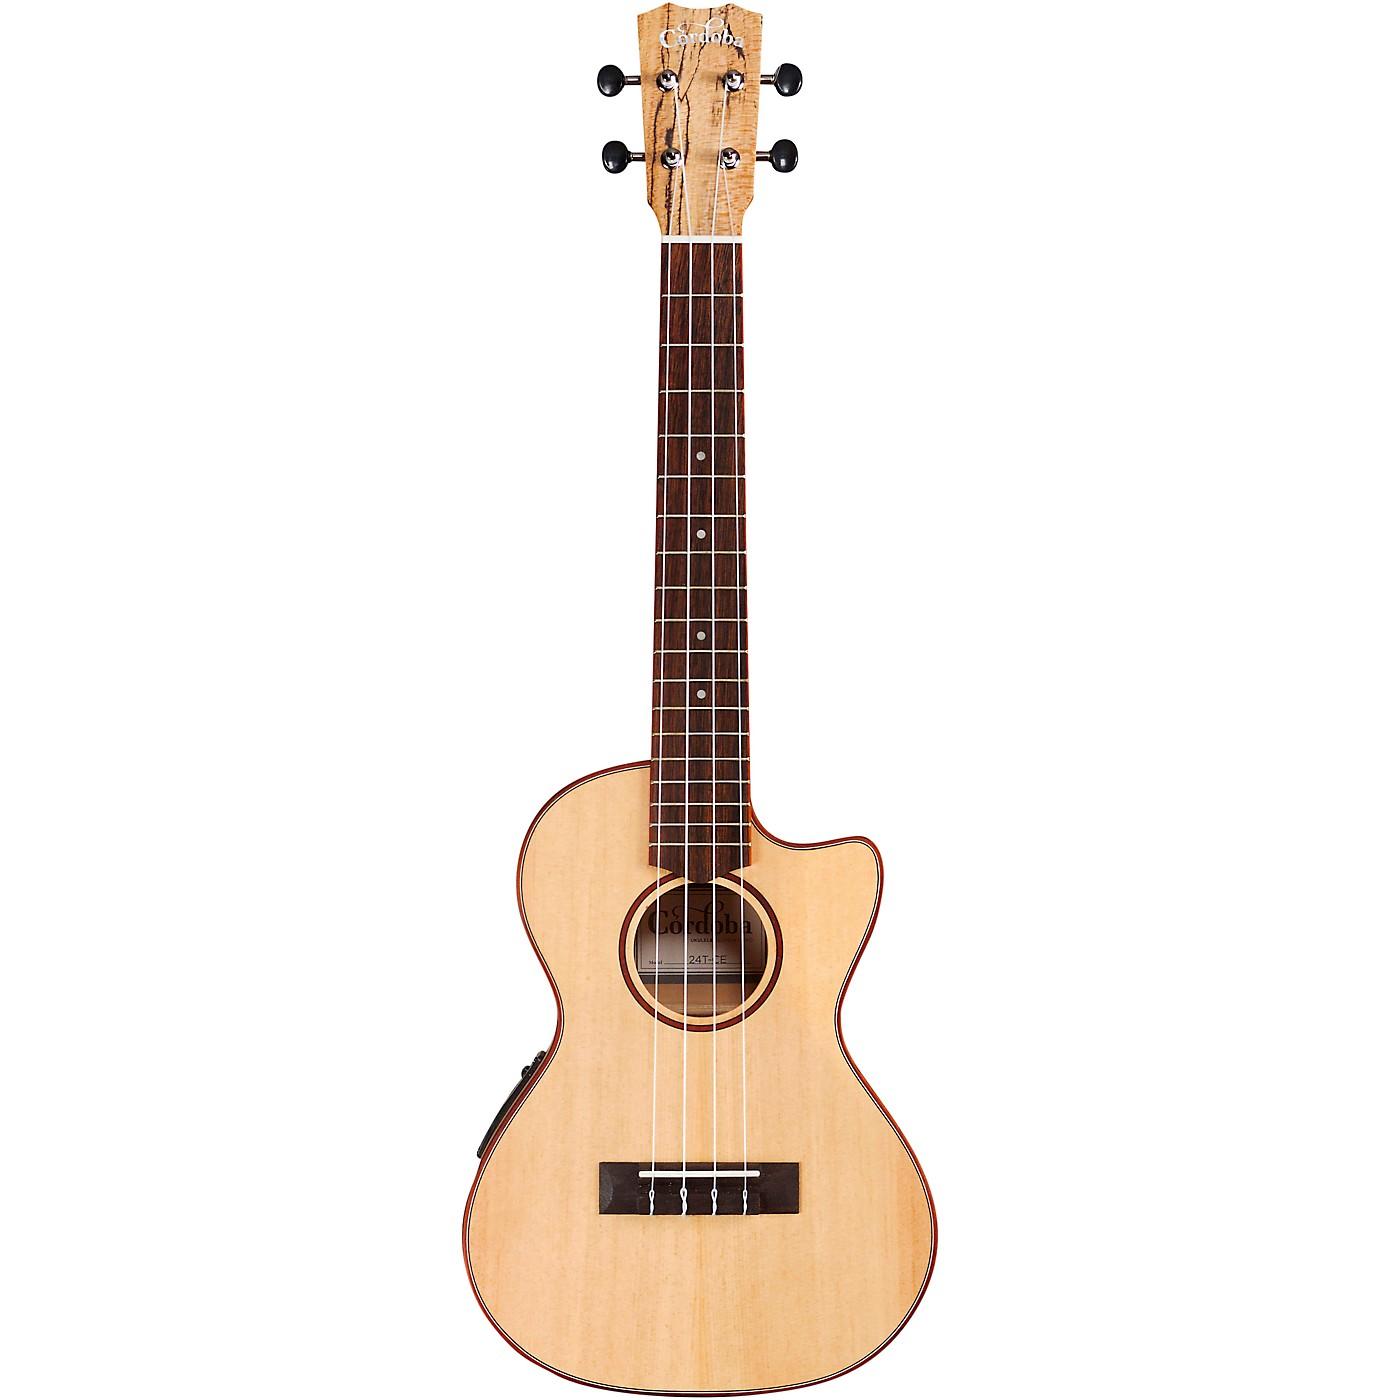 Cordoba 24T-CE Spruce Spalted Maple Cutaway Tenor Acoustic-Electric Ukulele thumbnail